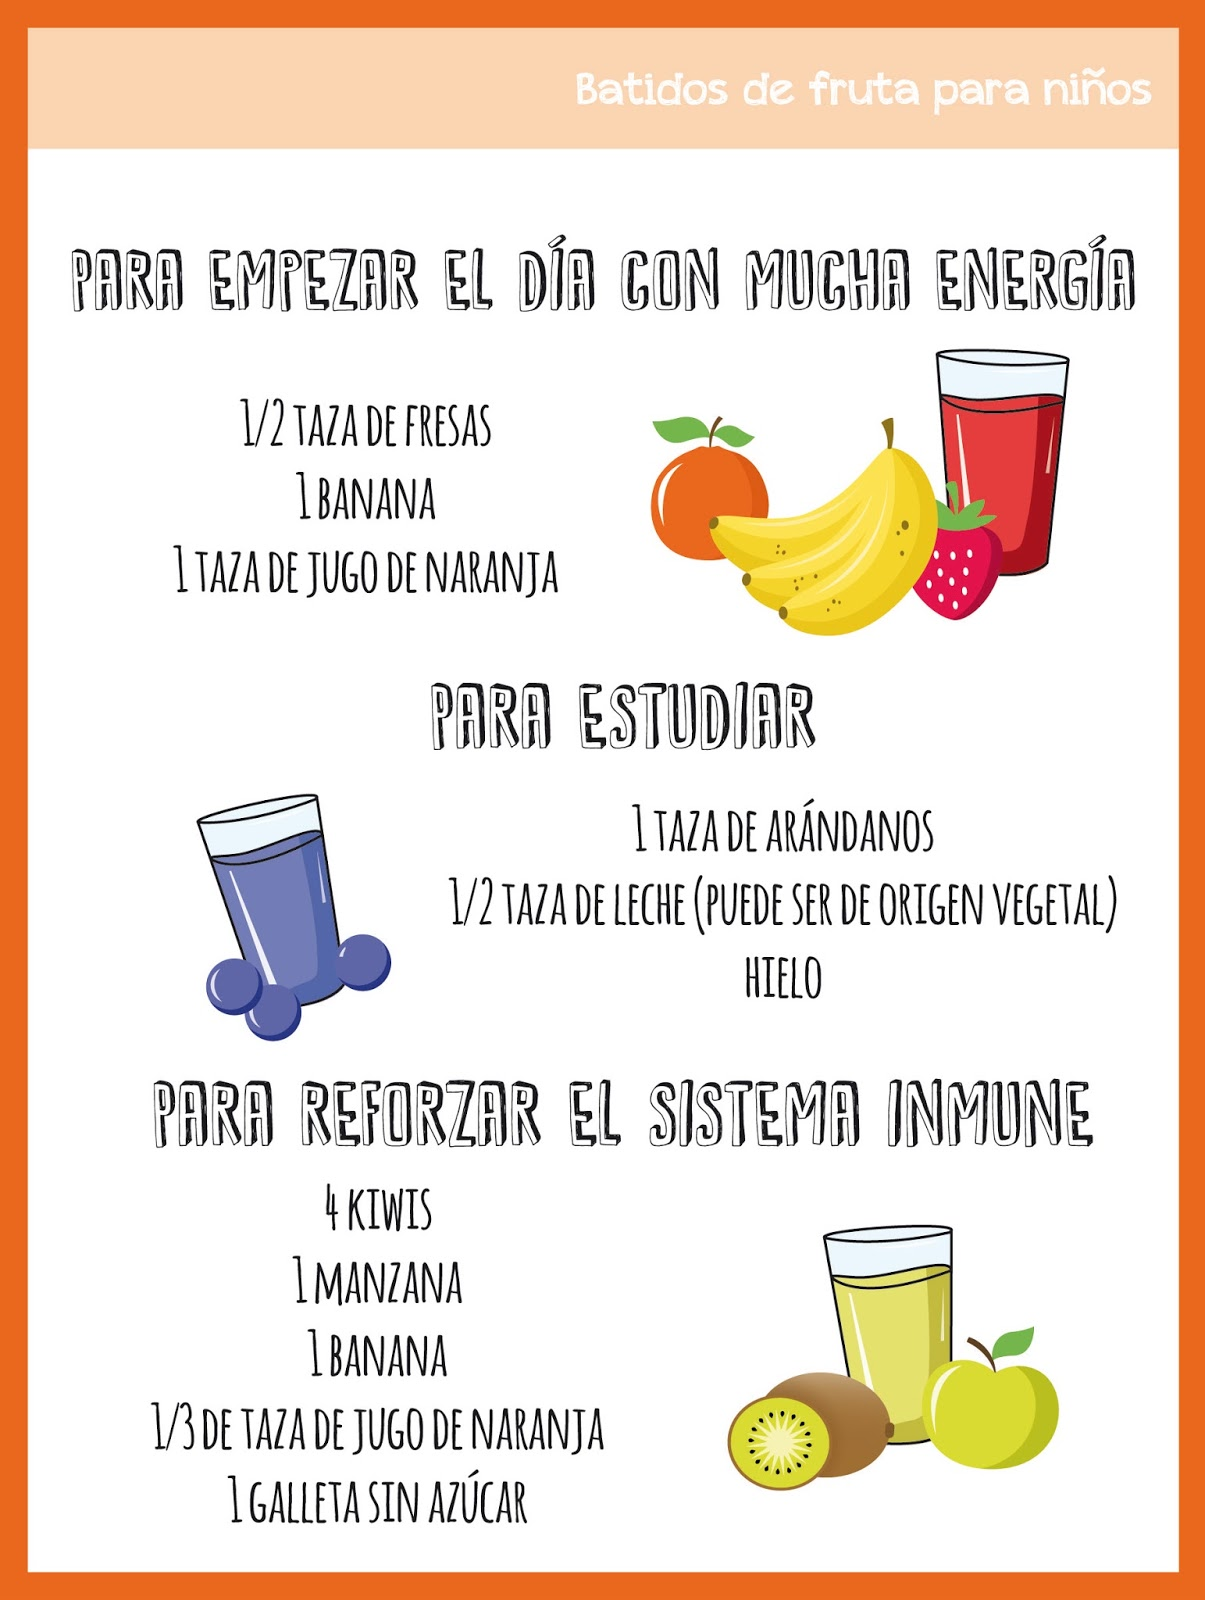 Dieta batidos de frutas